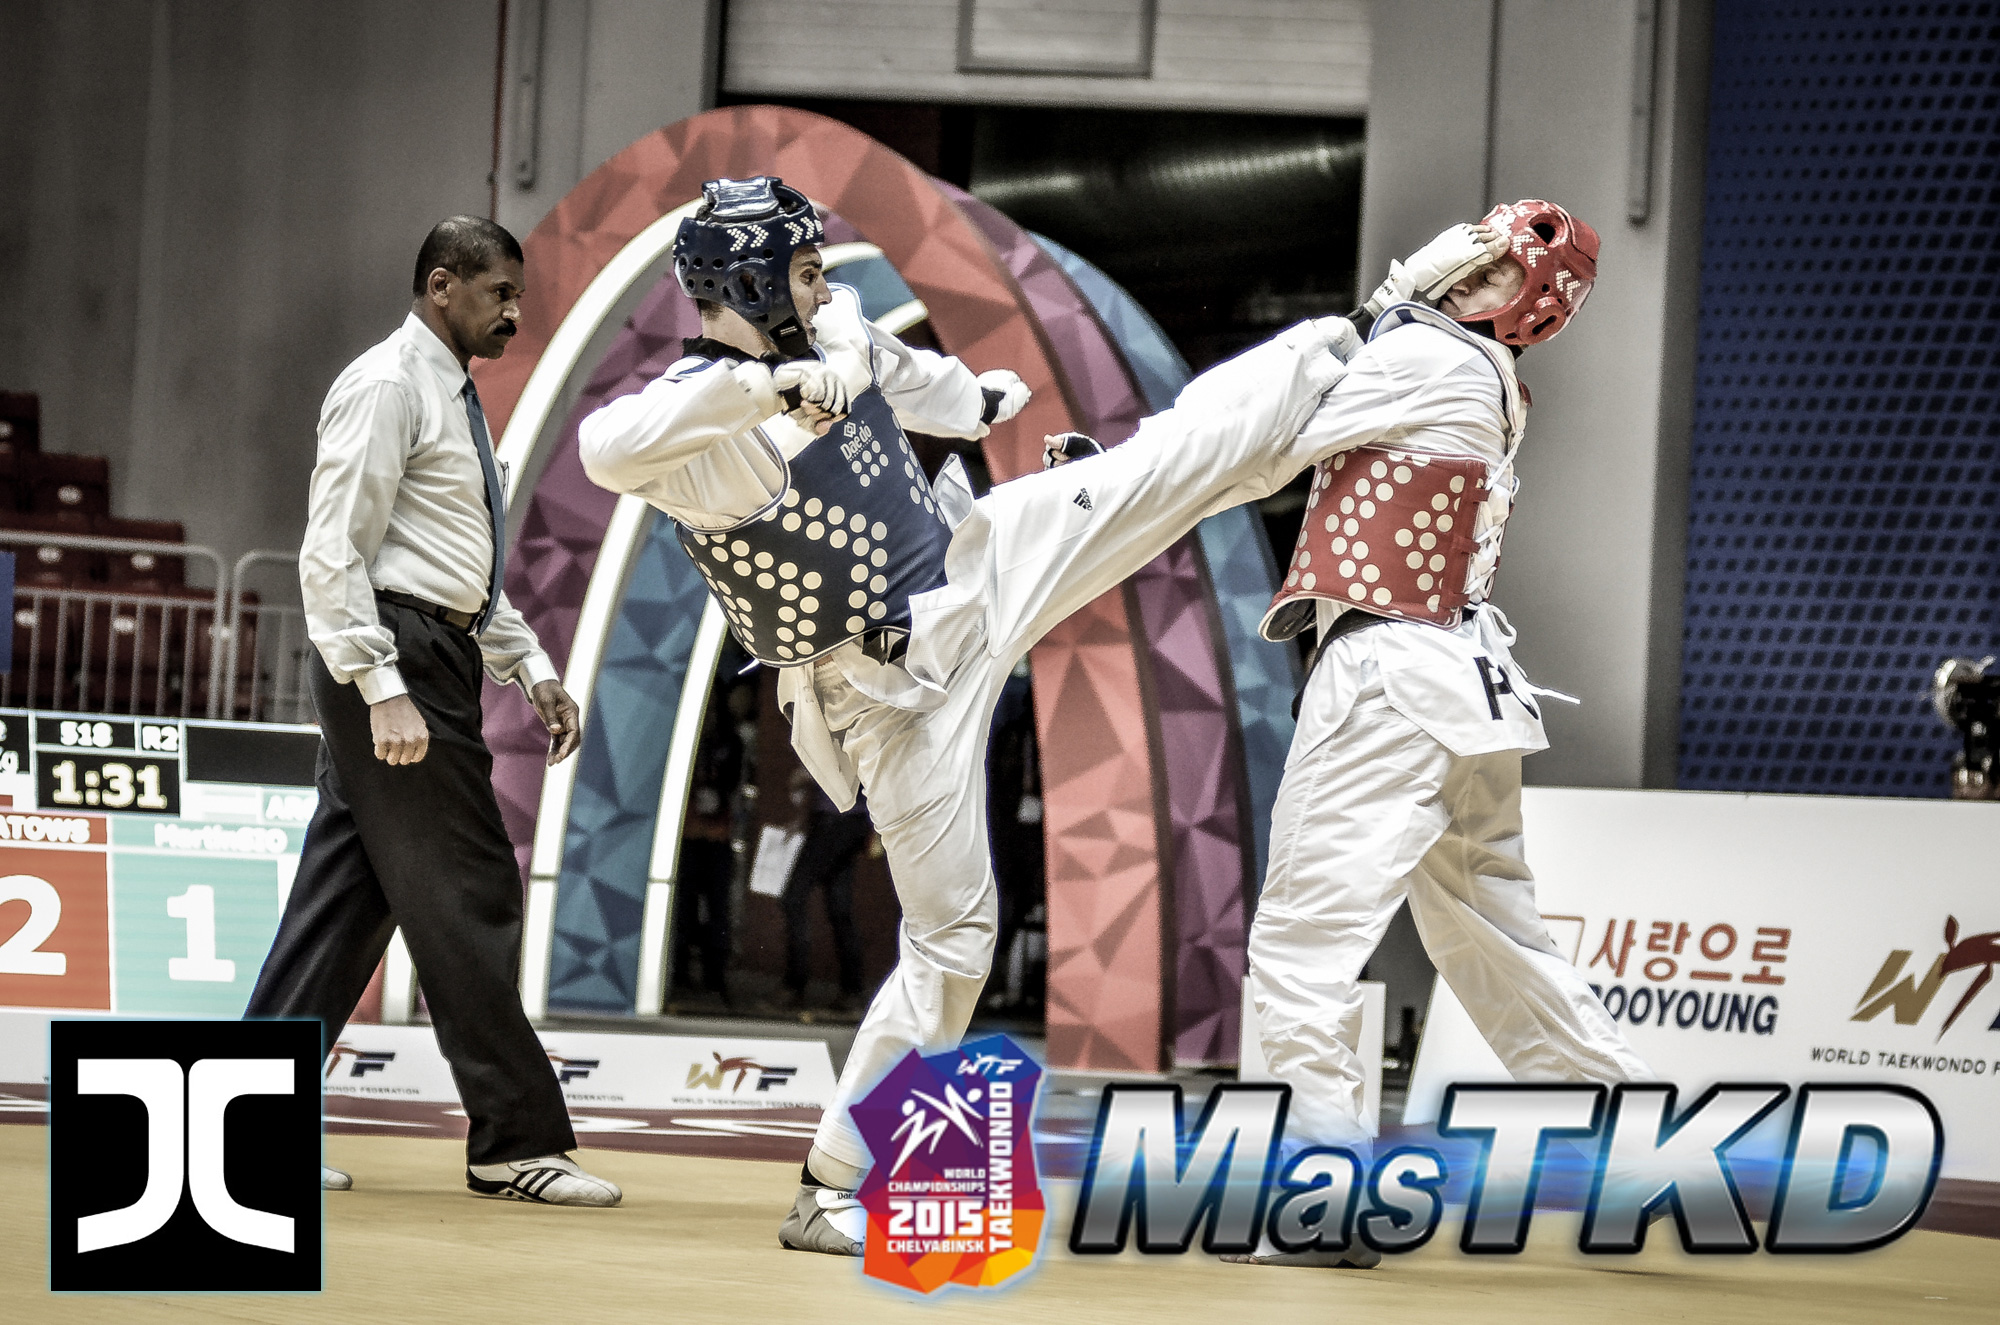 02_JCalicu-Mejores-imagenes-del-Mundial-de-Taekwondo_d5